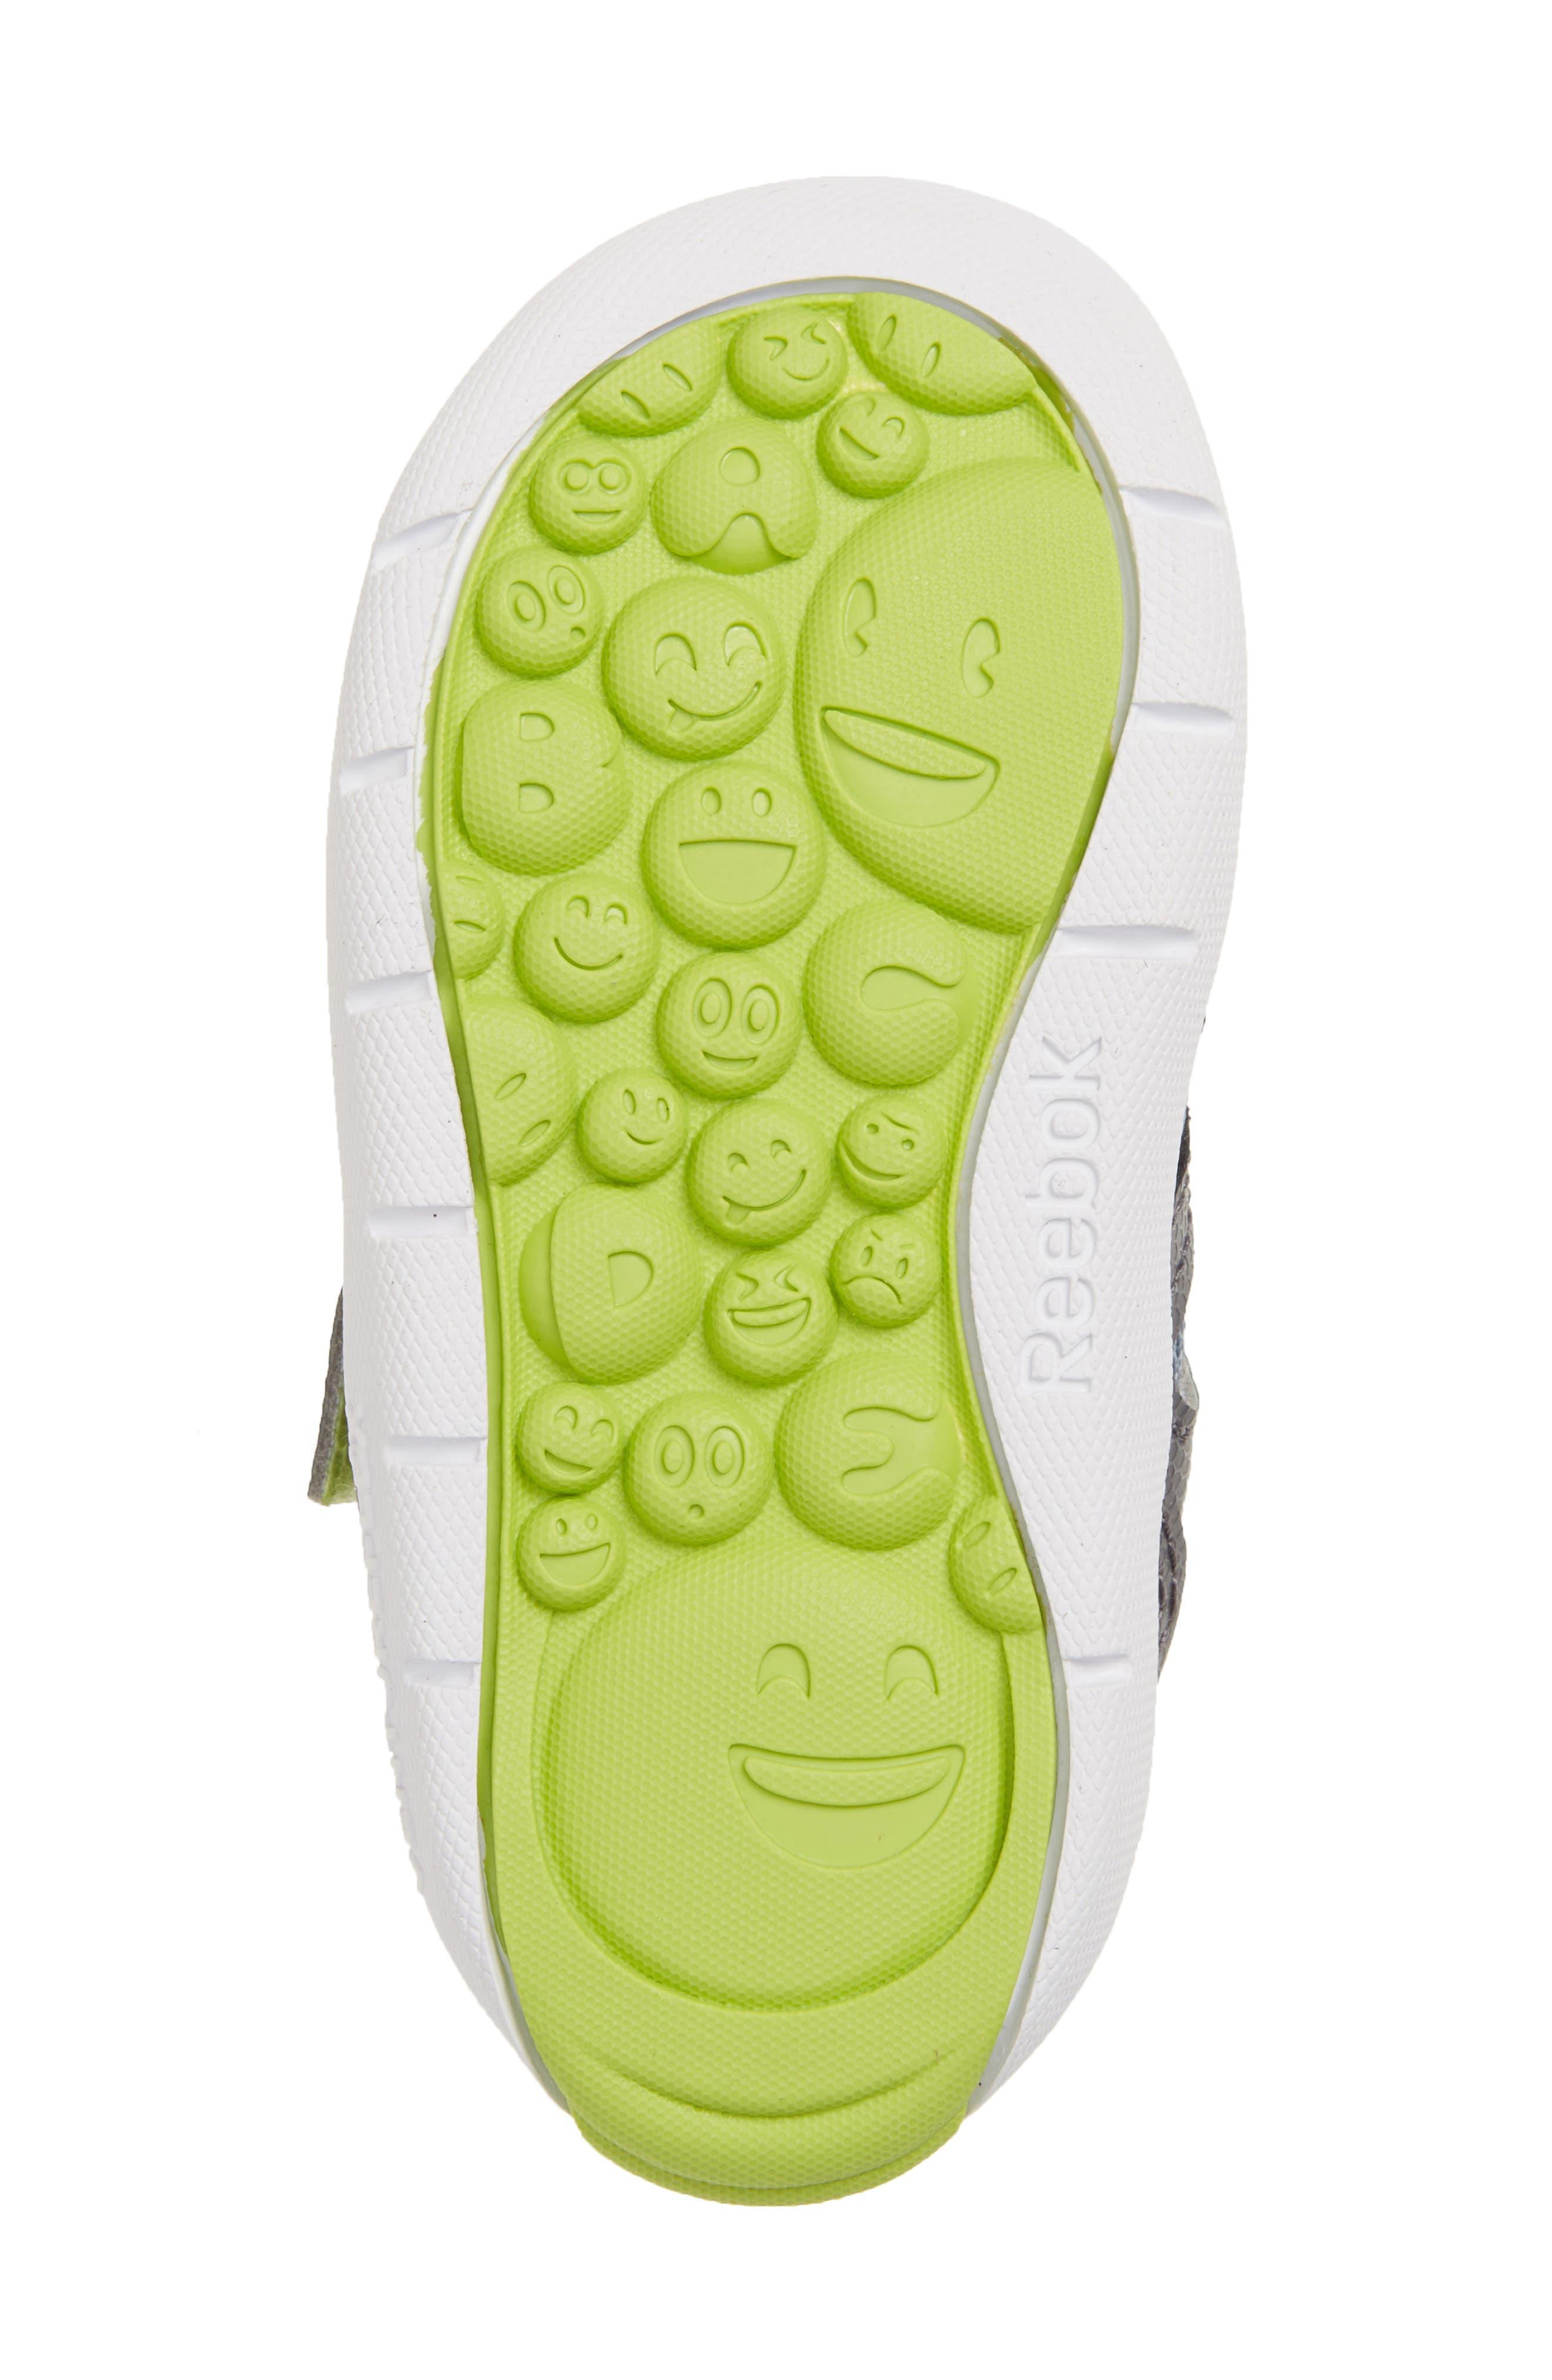 Ventureflex Stride 5.0 Sneaker,                             Alternate thumbnail 6, color,                             020